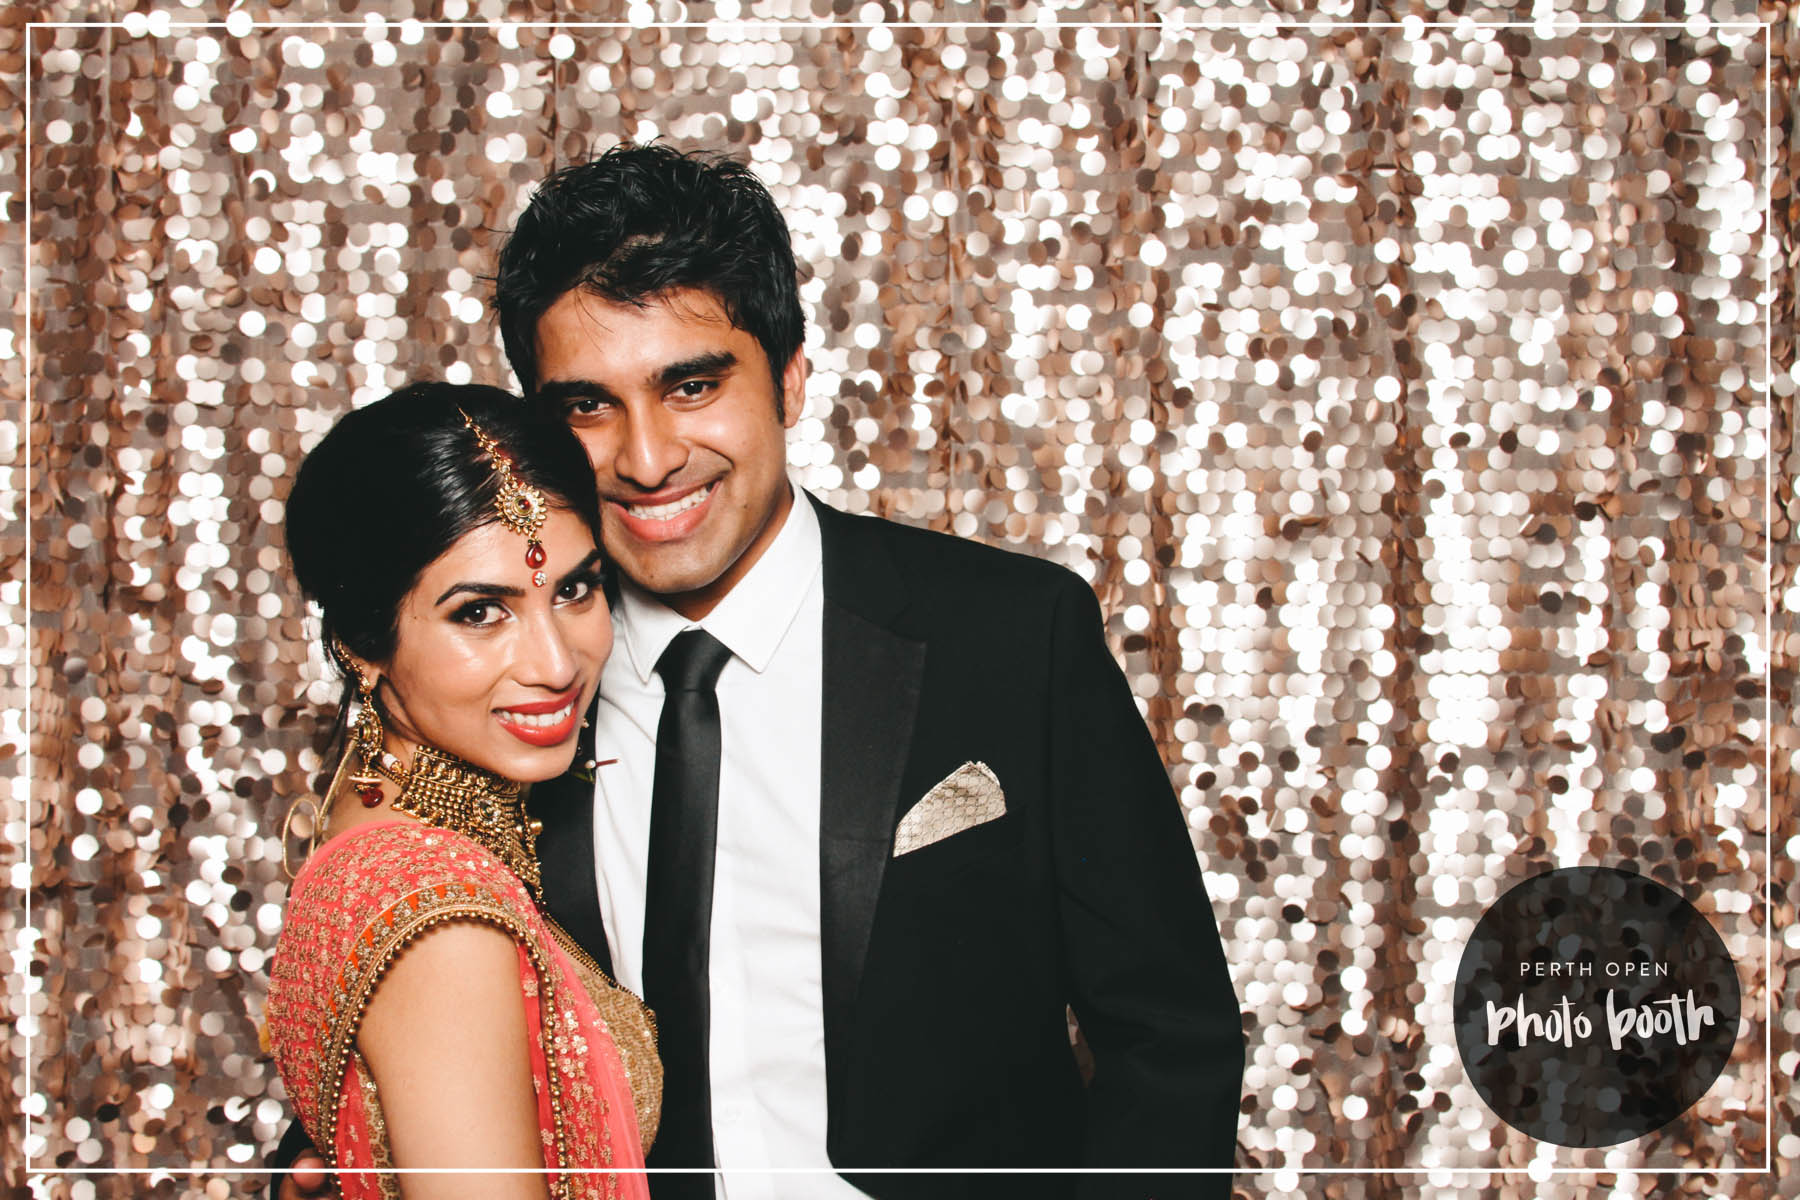 Shevya & Arindam's Wedding Reception   Password: Provided on the night   - all lowercase -